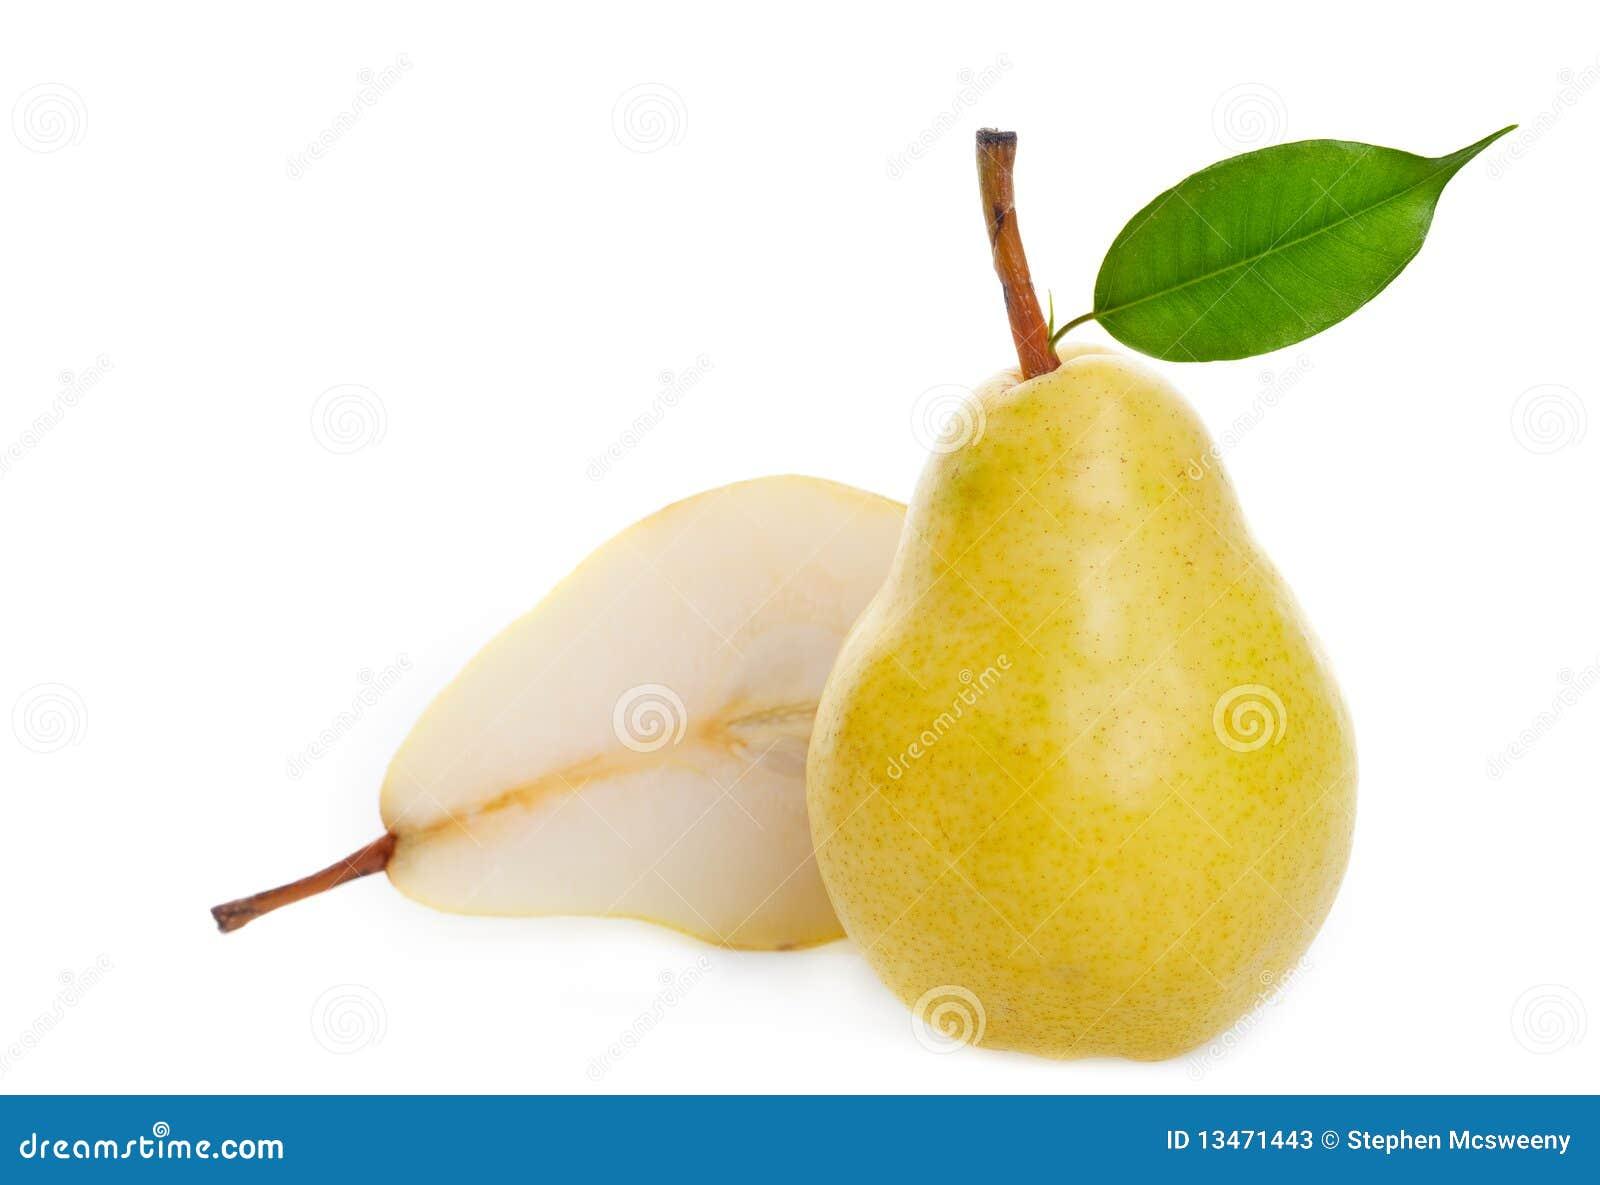 Juicy golden pear